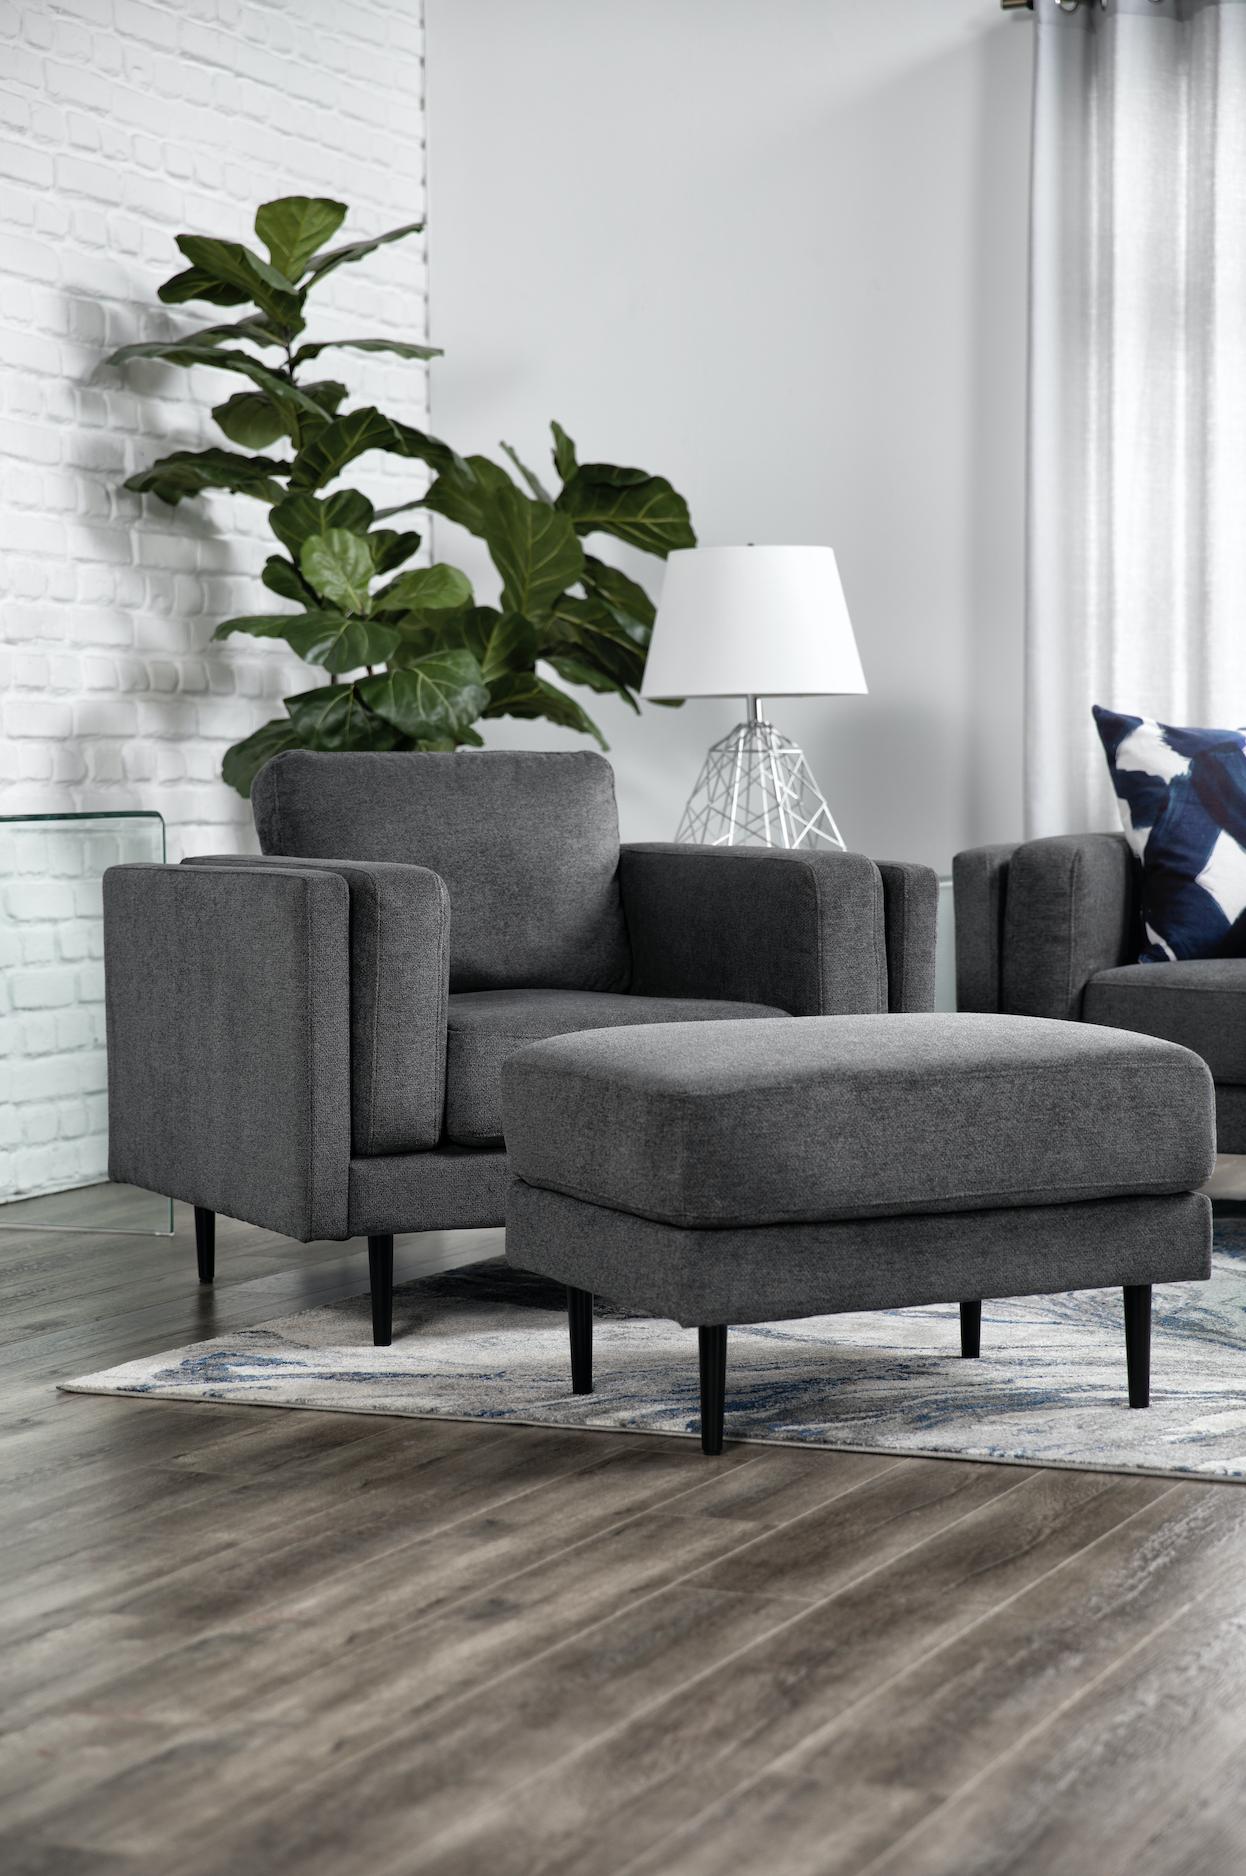 Aaron Charcoal Chair In 2020 Eclectic Living Room Charcoal Chair Colourful Living Room #sleek #modern #living #room